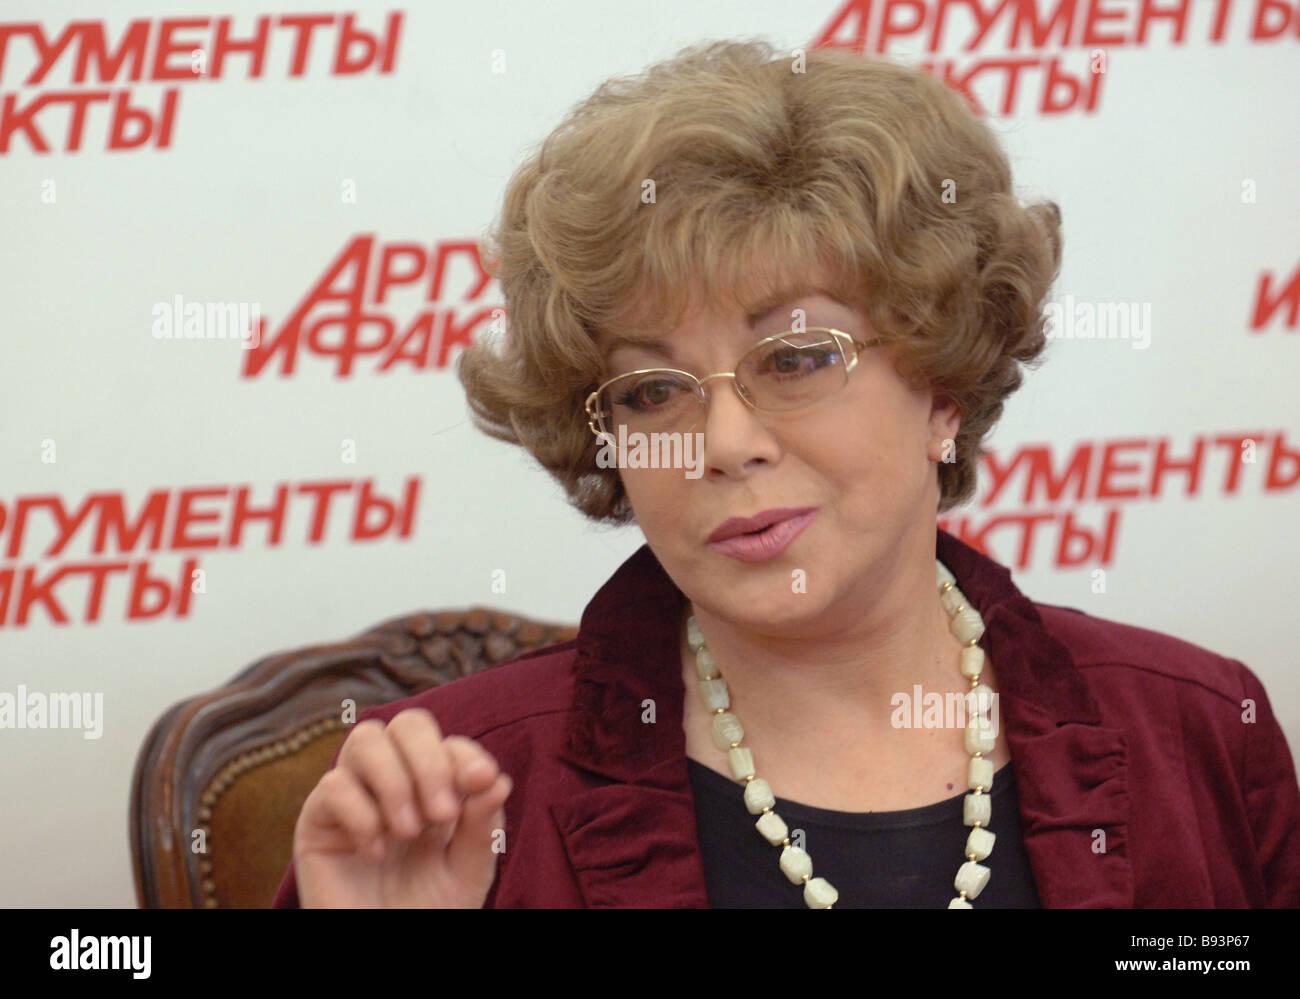 Edita Piekha was hospitalized with a serious illness 05.04.2018